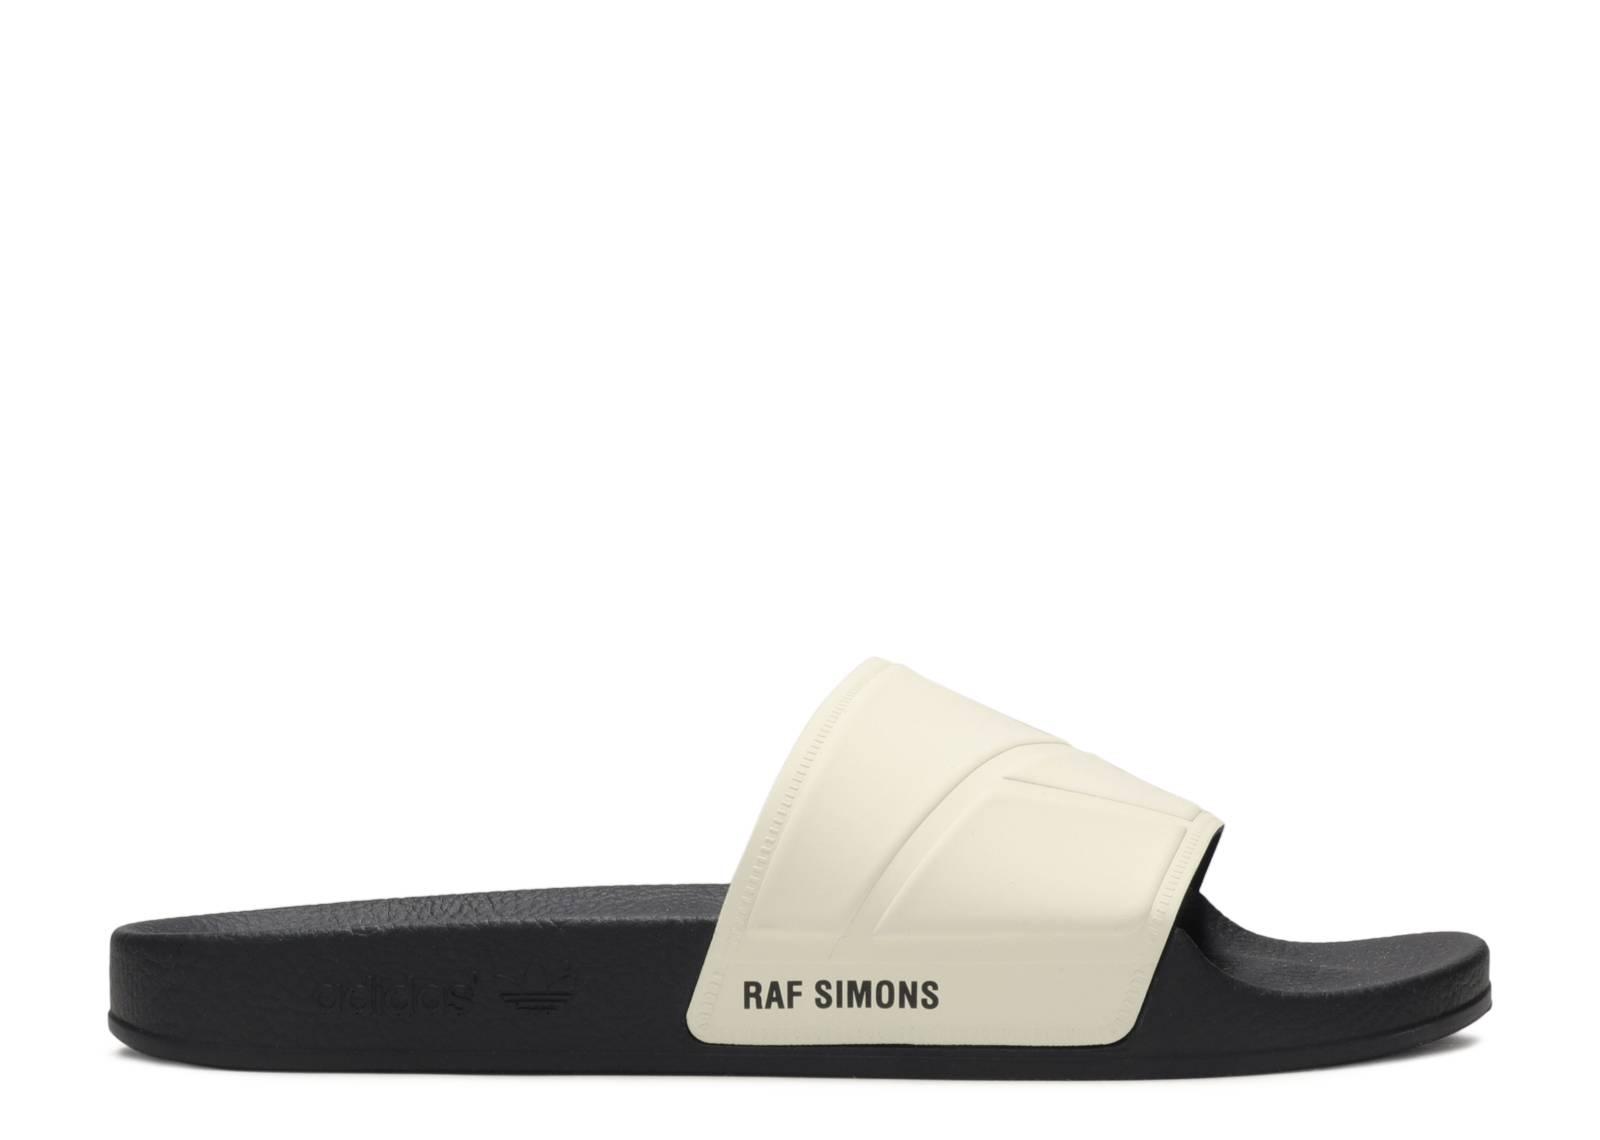 raf simons x adilette slides